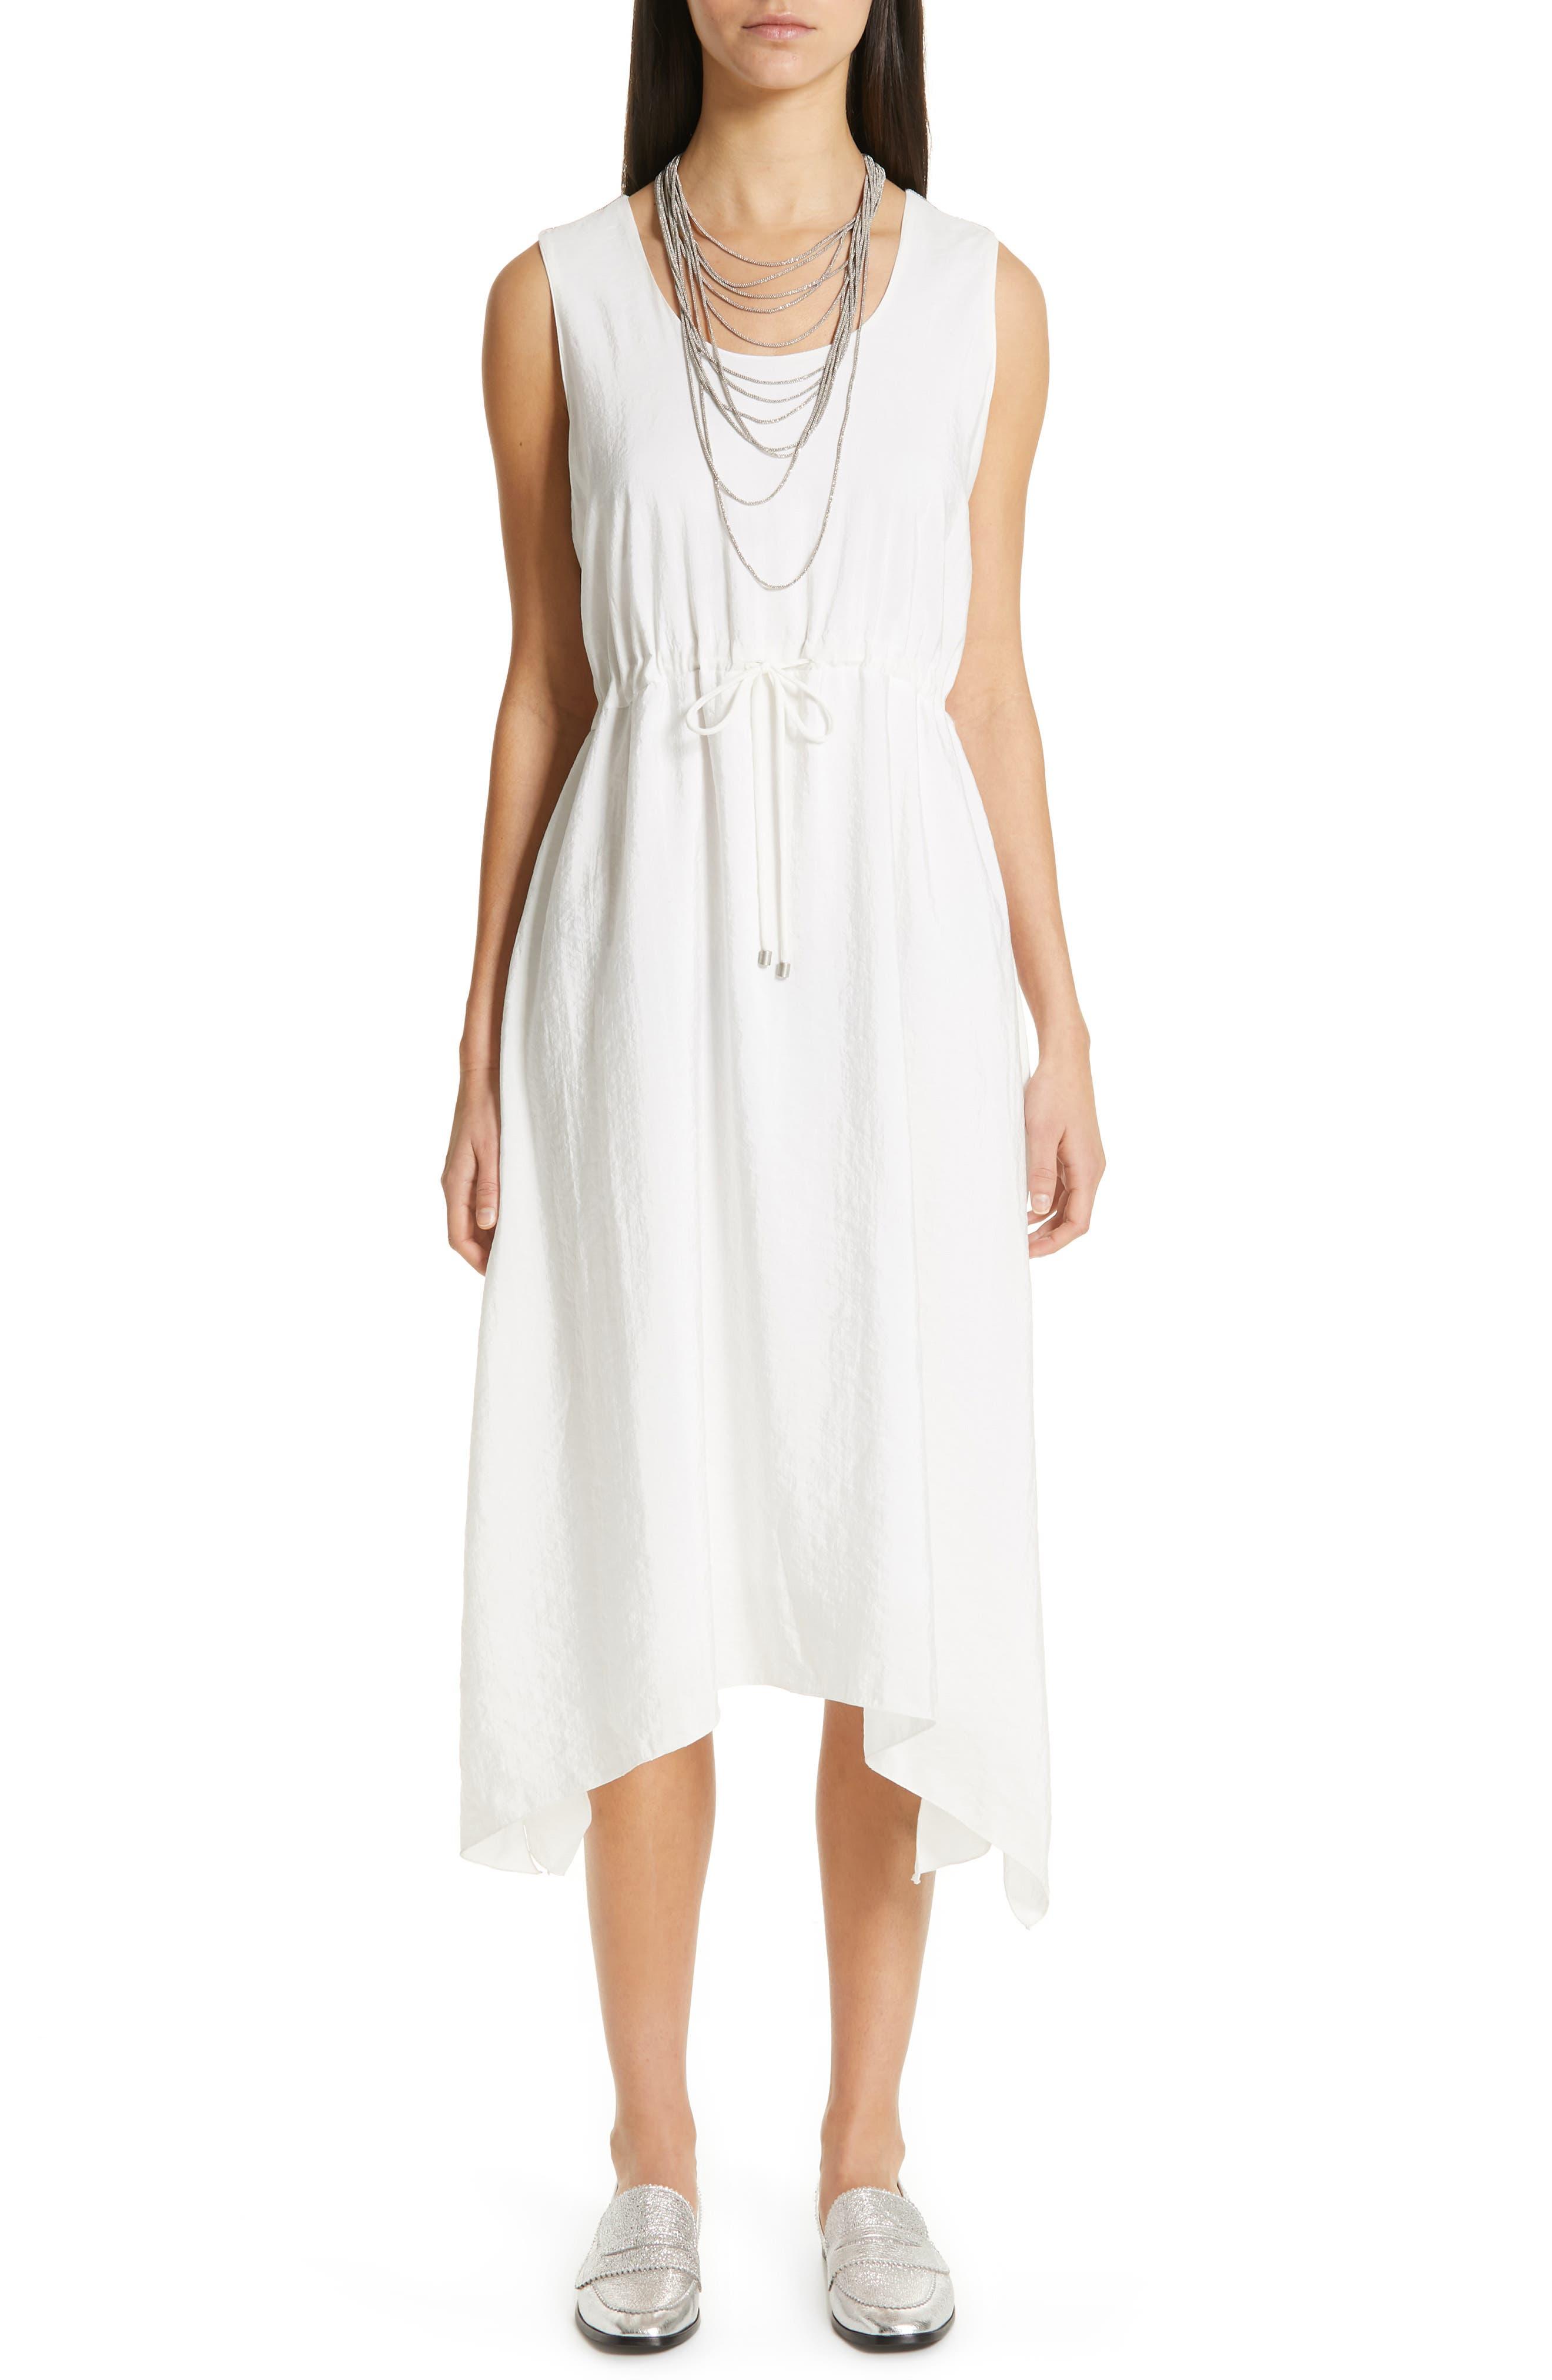 Fabiana Filippi Silk Blend Poplin Dress, 50 IT - White